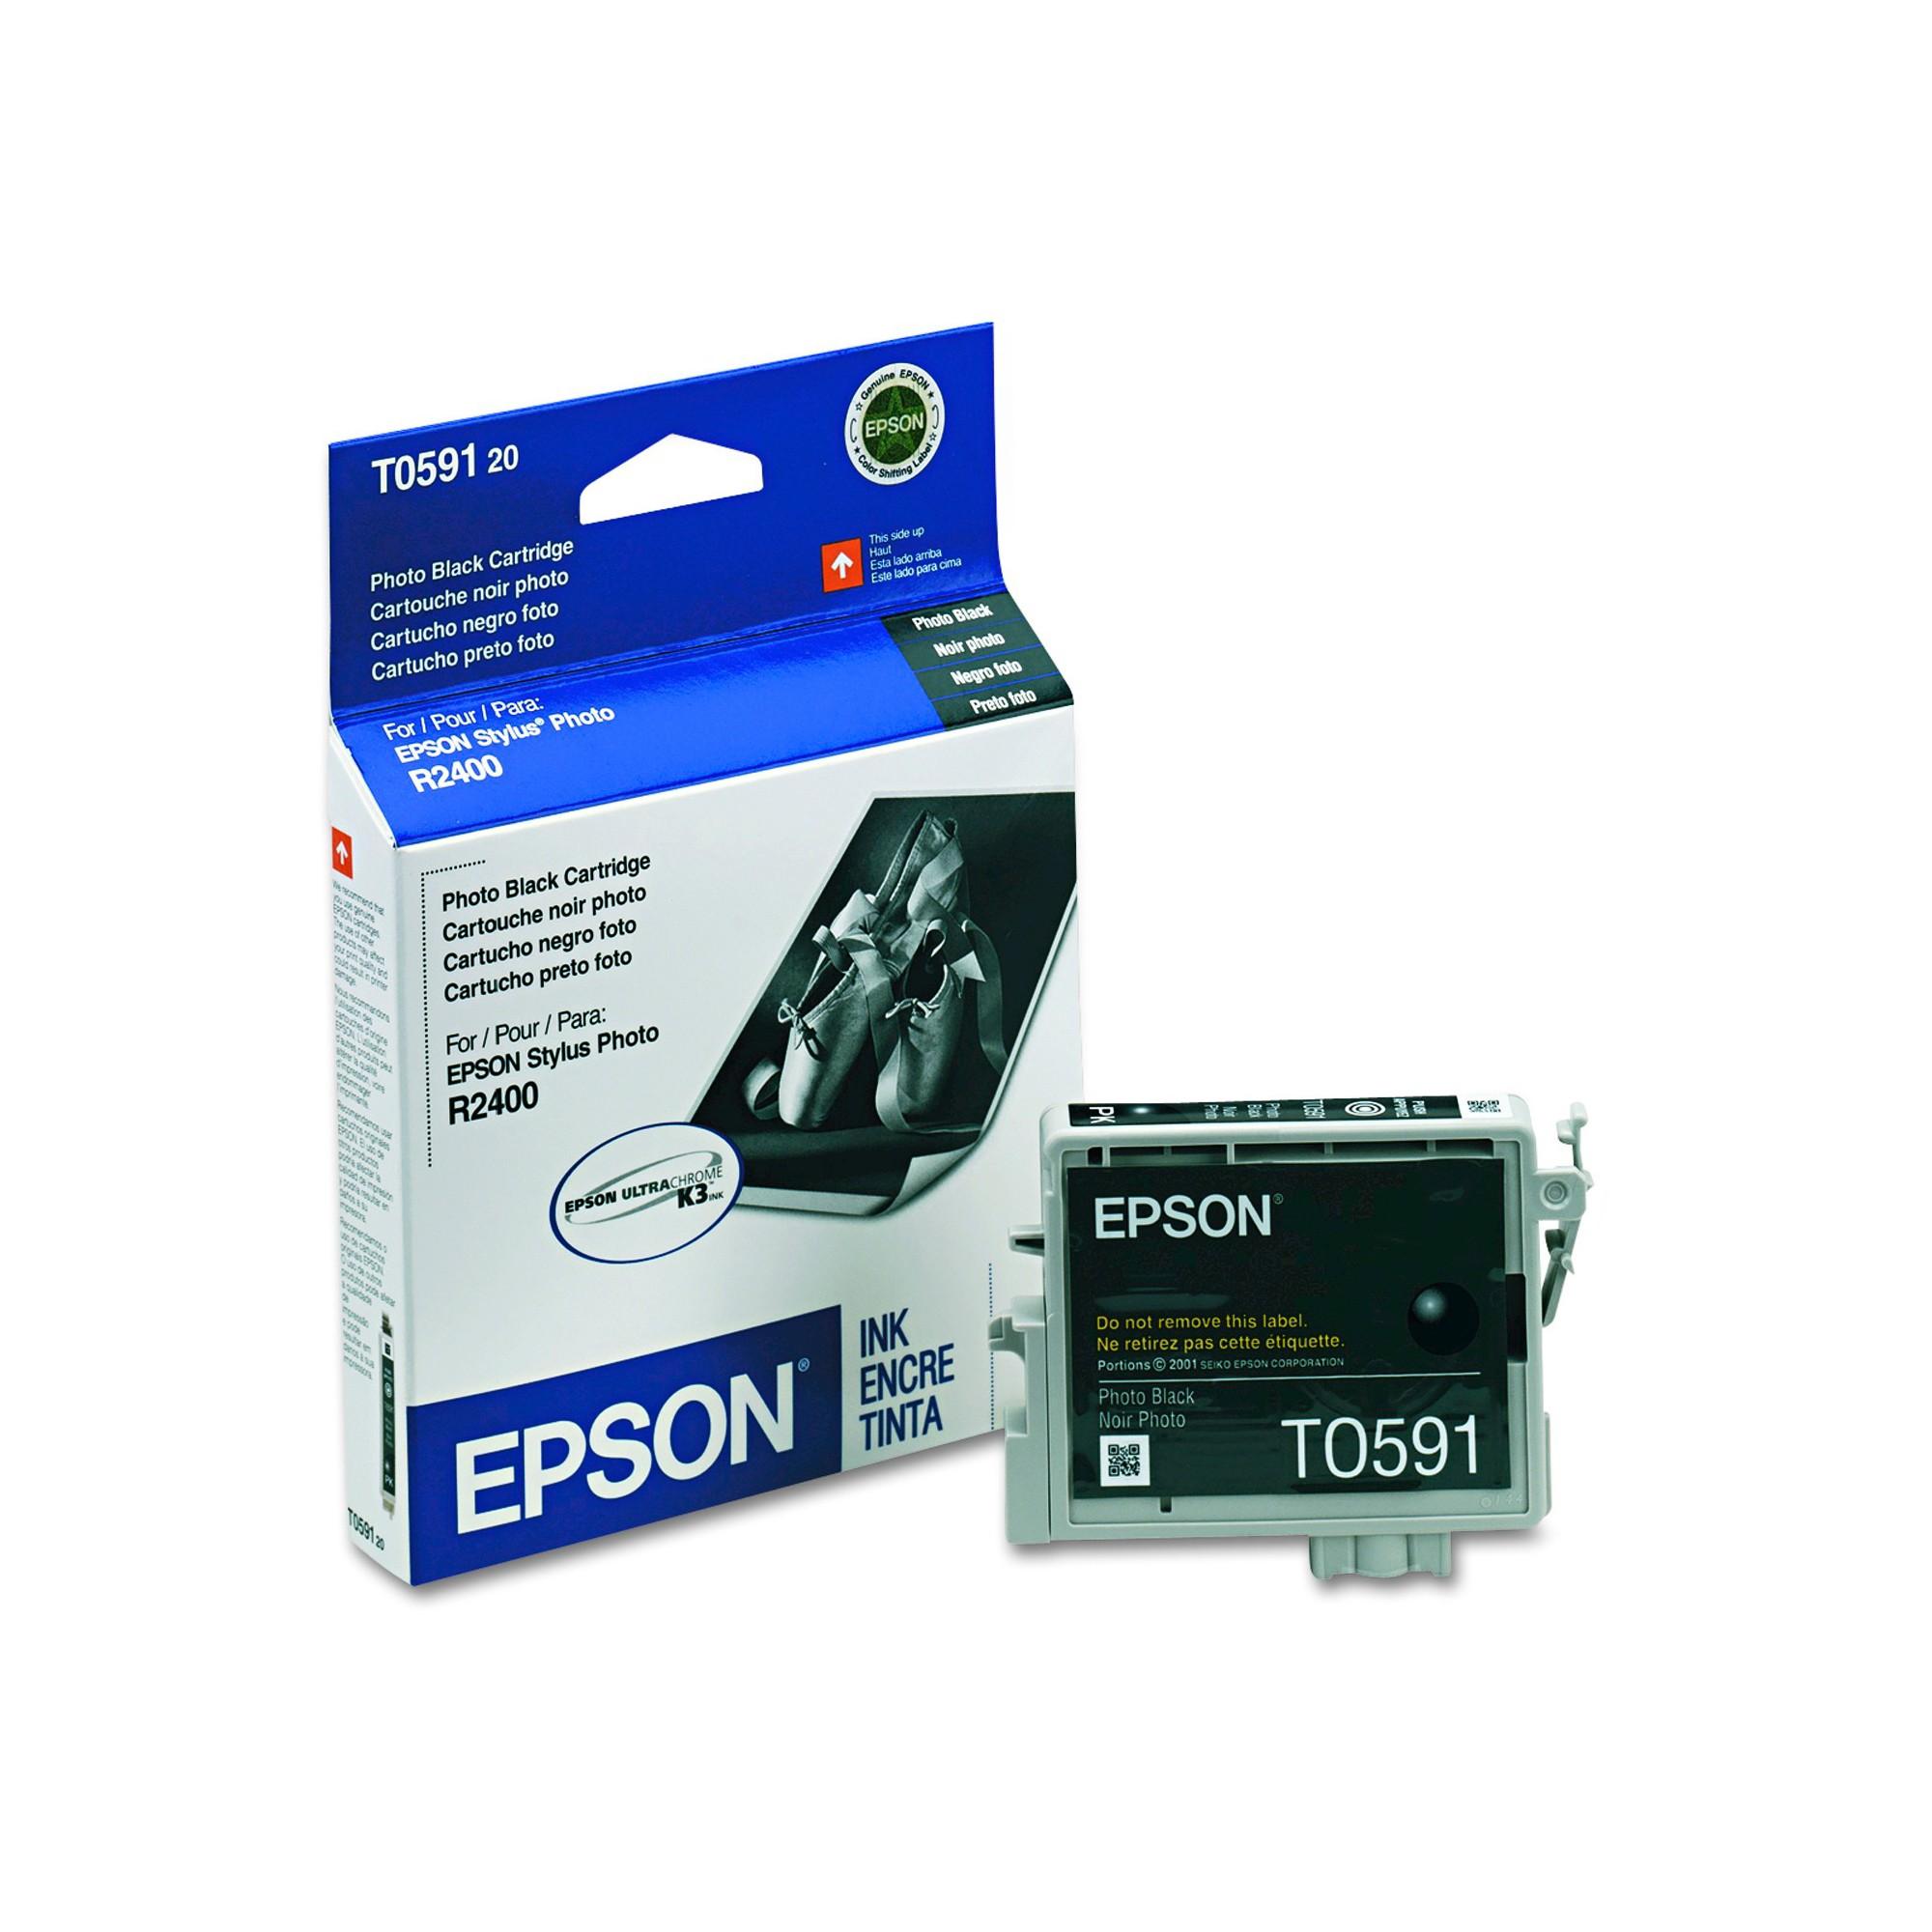 Epson kitchen printer  Epson  Photo Black Ink Printer Ink Cartridges  Photo black